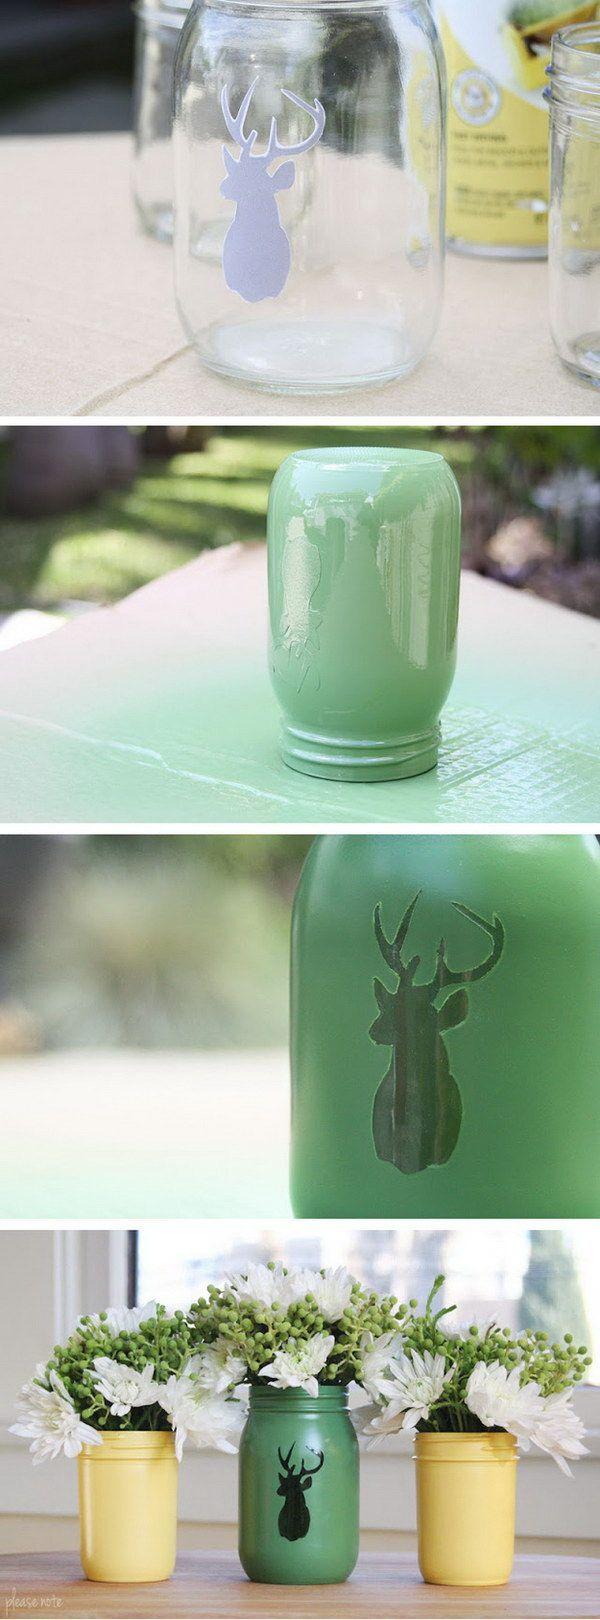 DIY Stenciled Mason Jar Vase. -minus the reindeer.